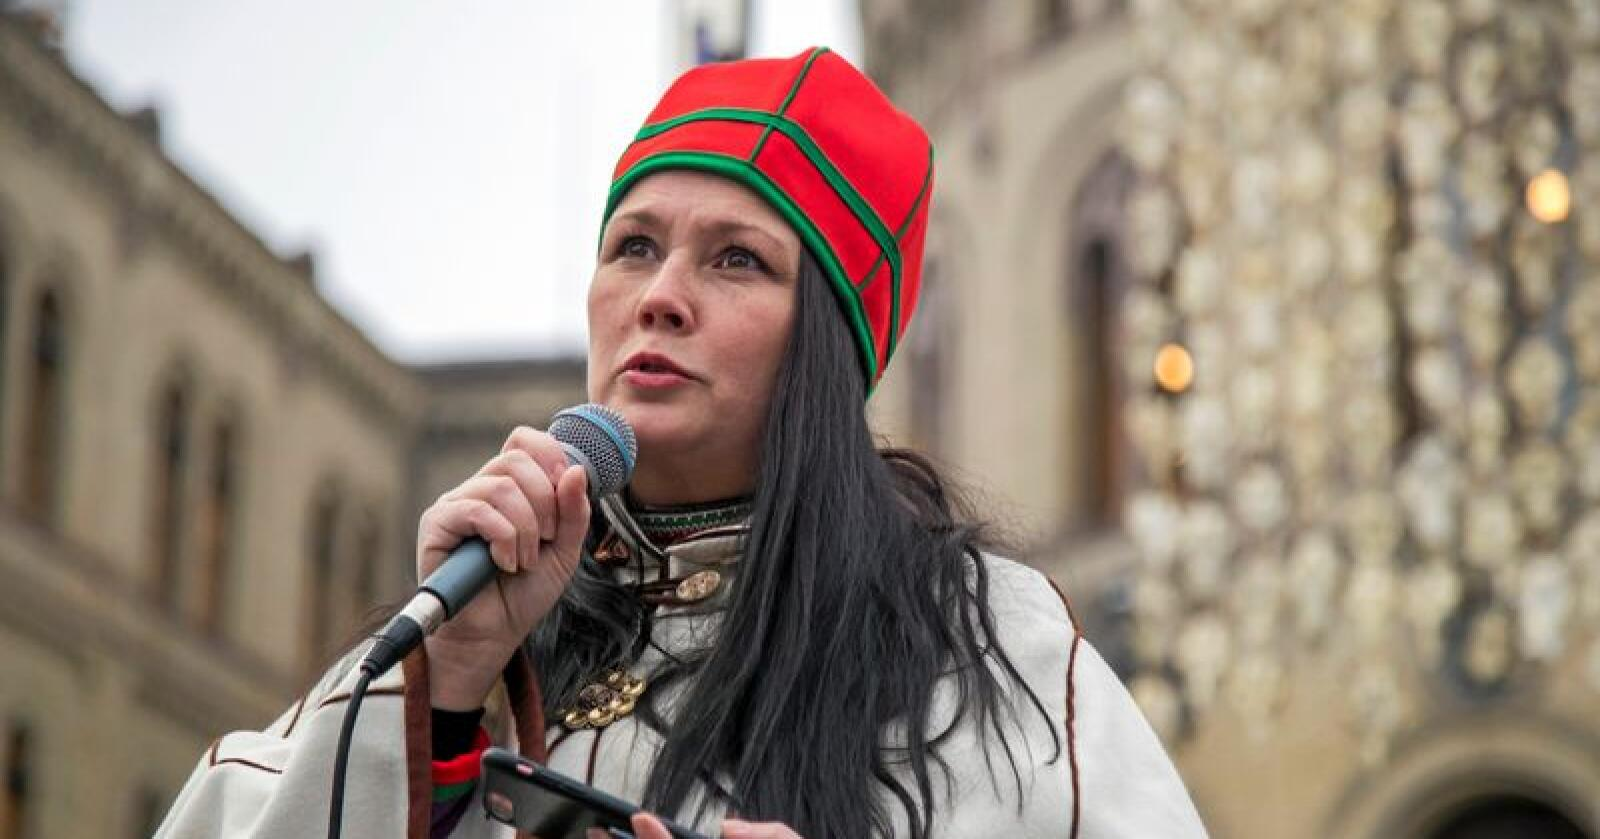 Ellinor Marita Jåma, leder i Norske reindriftssamers landsforbund, fotografert foran Stortinget i fjor. Foto: Heiko Junge / NTB scanpix